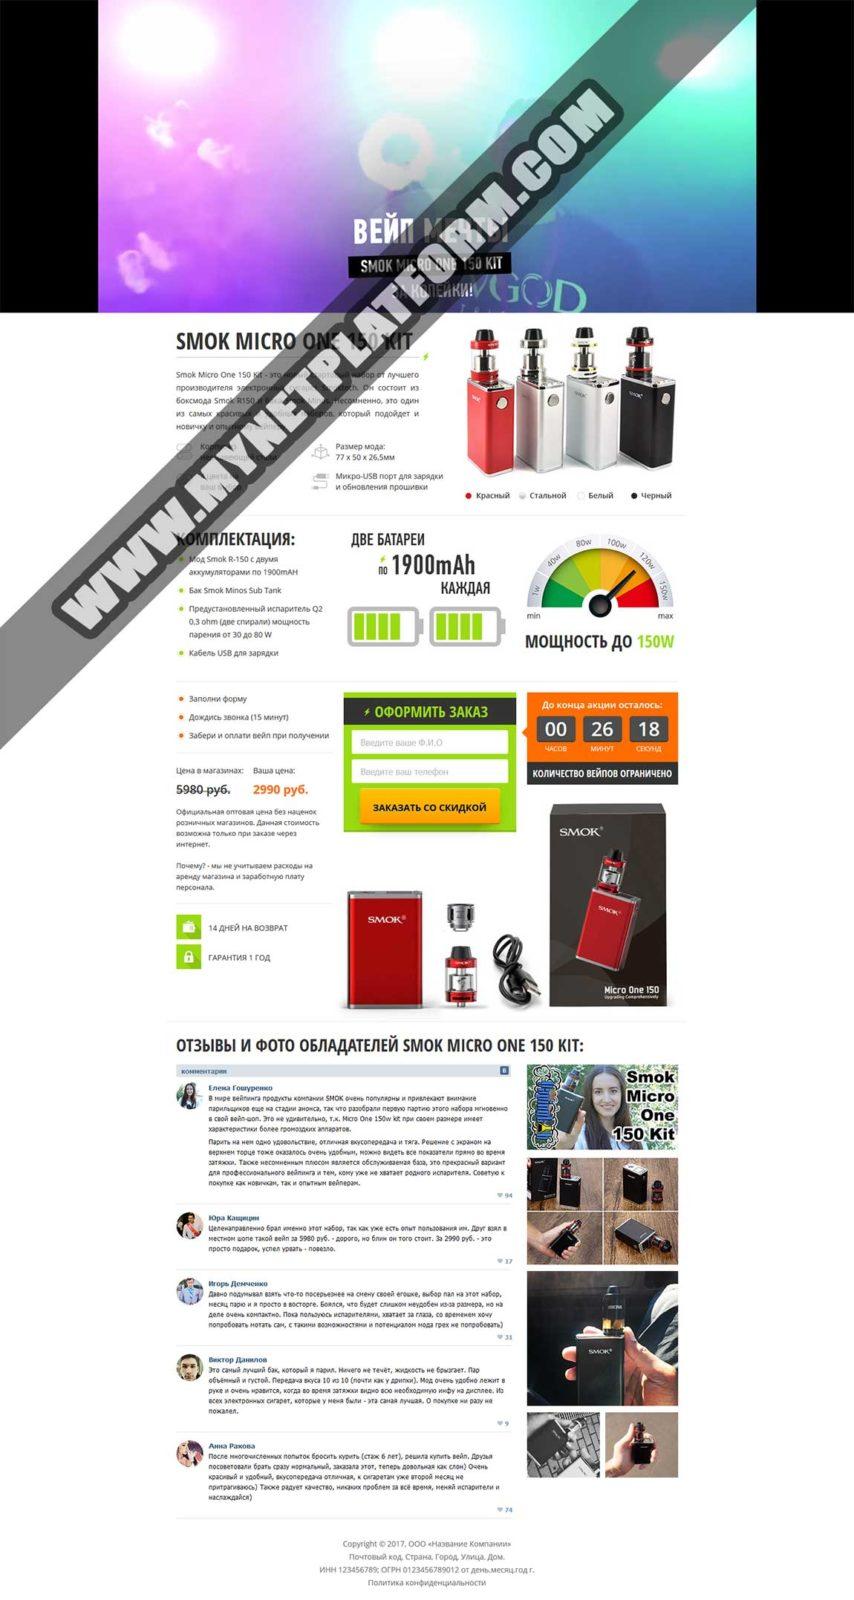 Скриншот Готового лендинга SMOK Micro one 150 Kit - стартовый набор от Smoktech 001